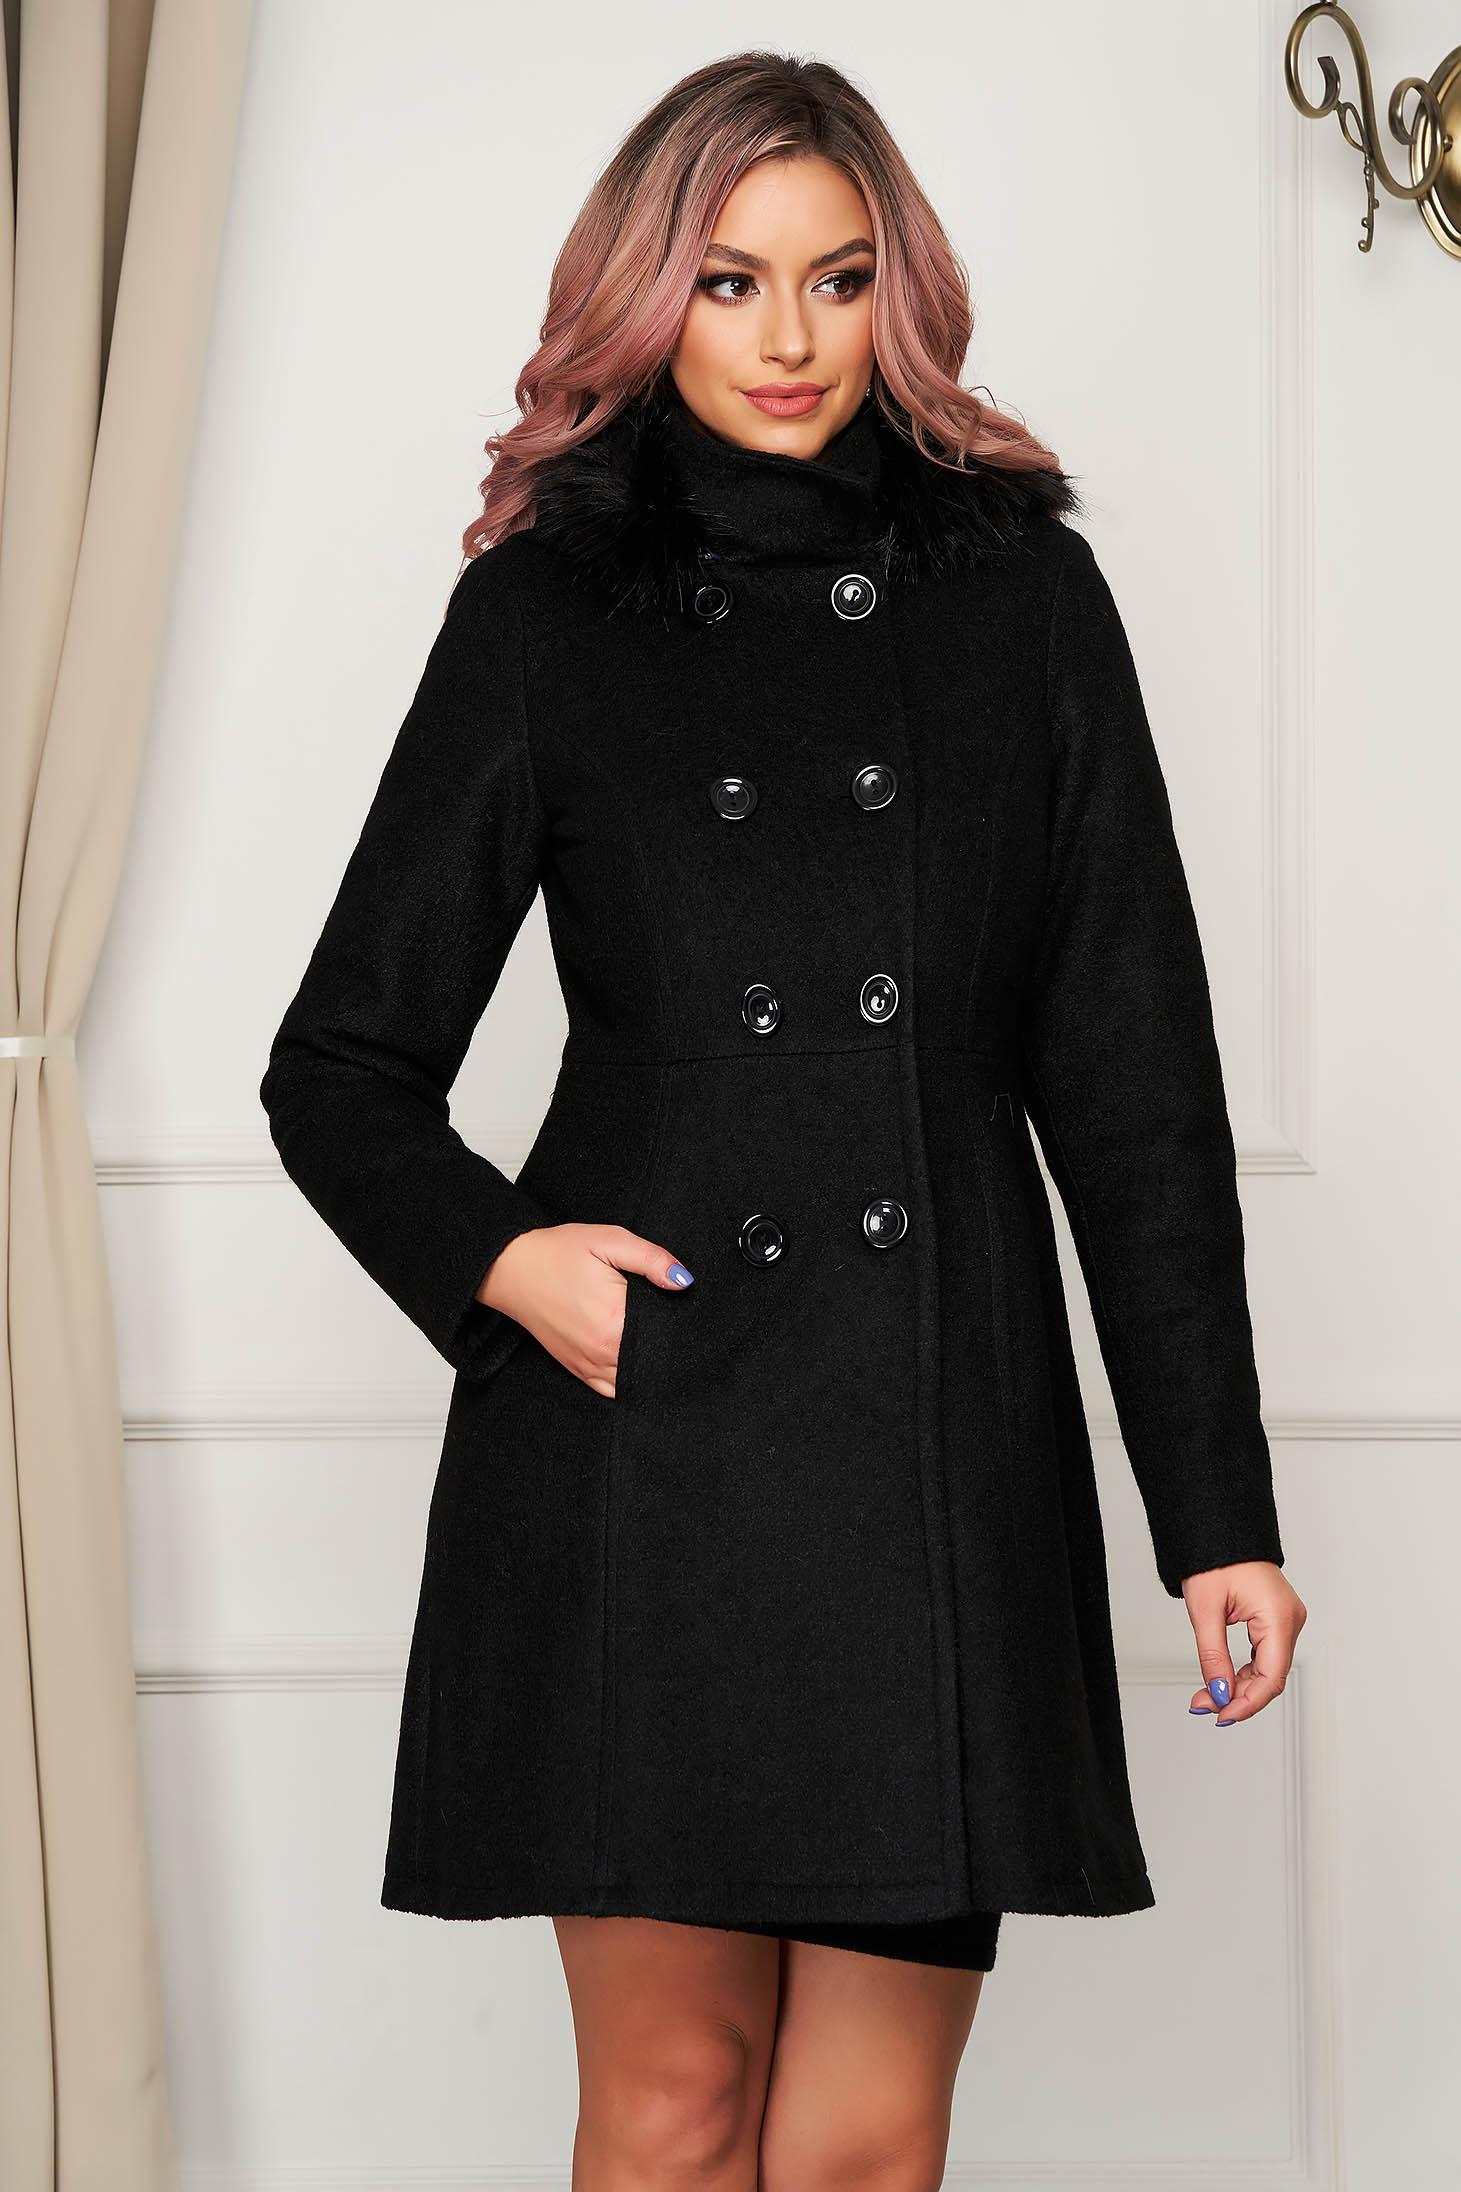 Palton din lana SunShine negru elegant cu un croi drept cu guler din blana artificiala